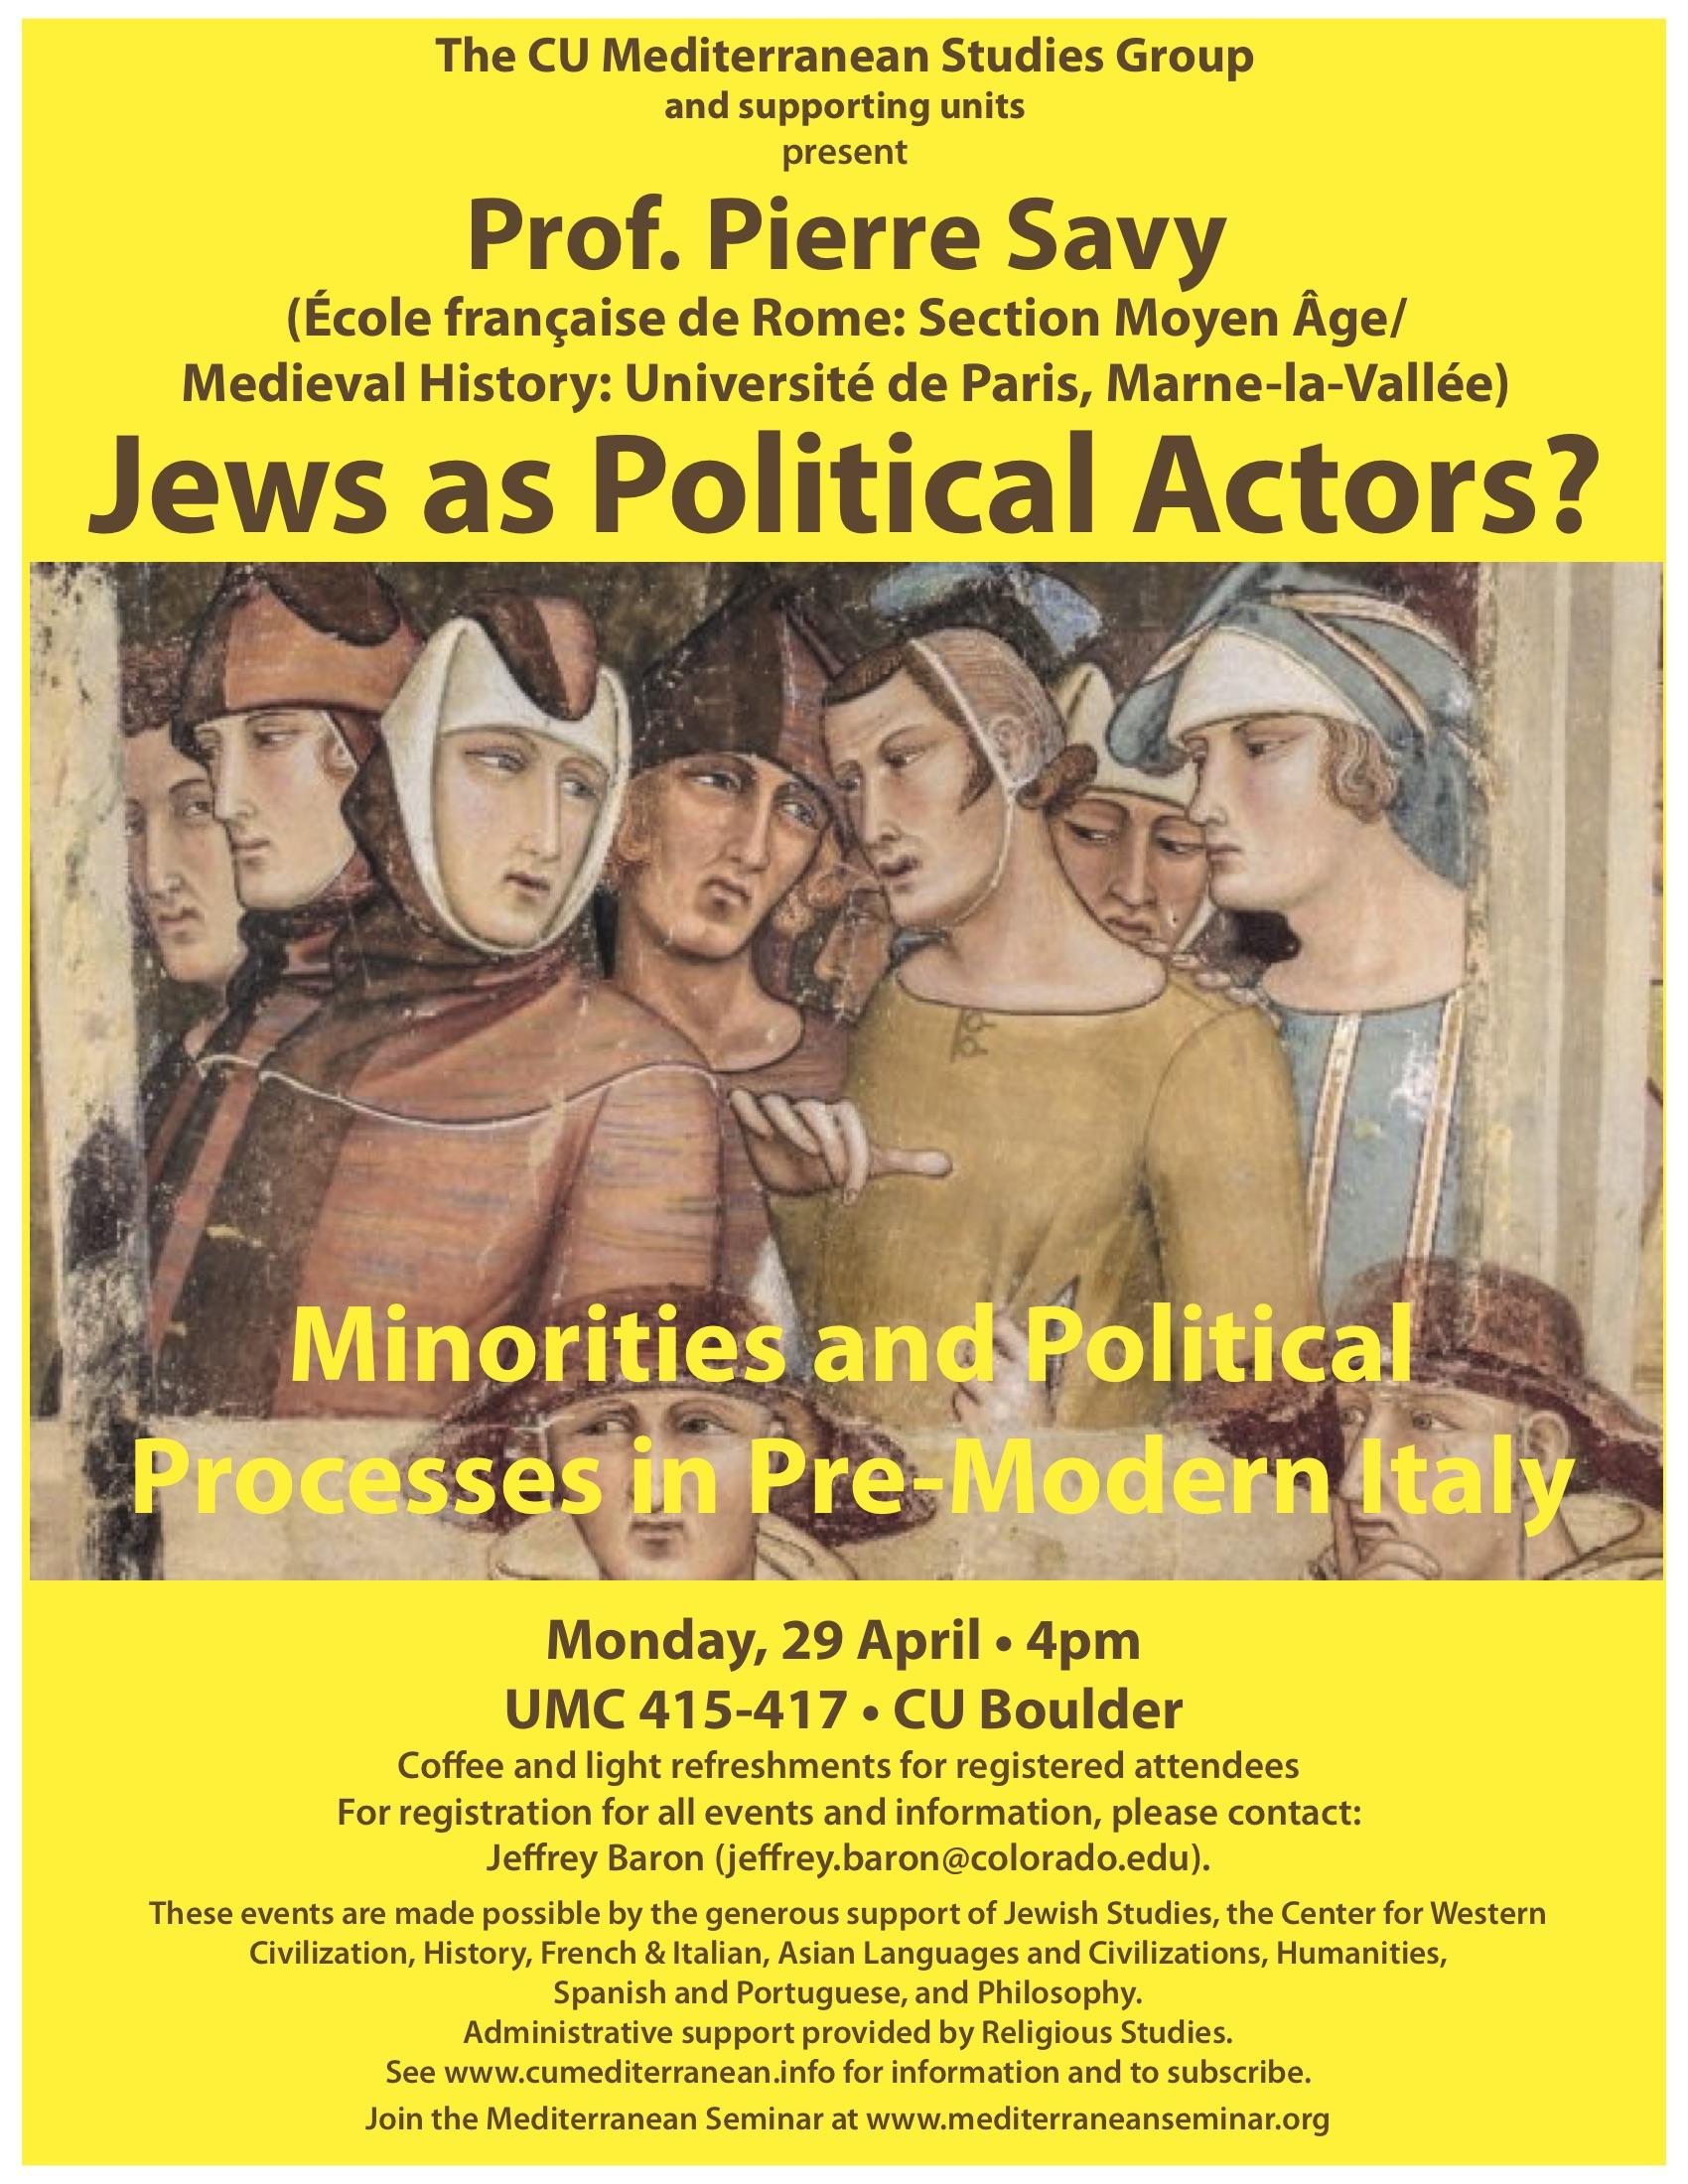 190329 Savy Jews as Political Actors CU Med Group.jpg